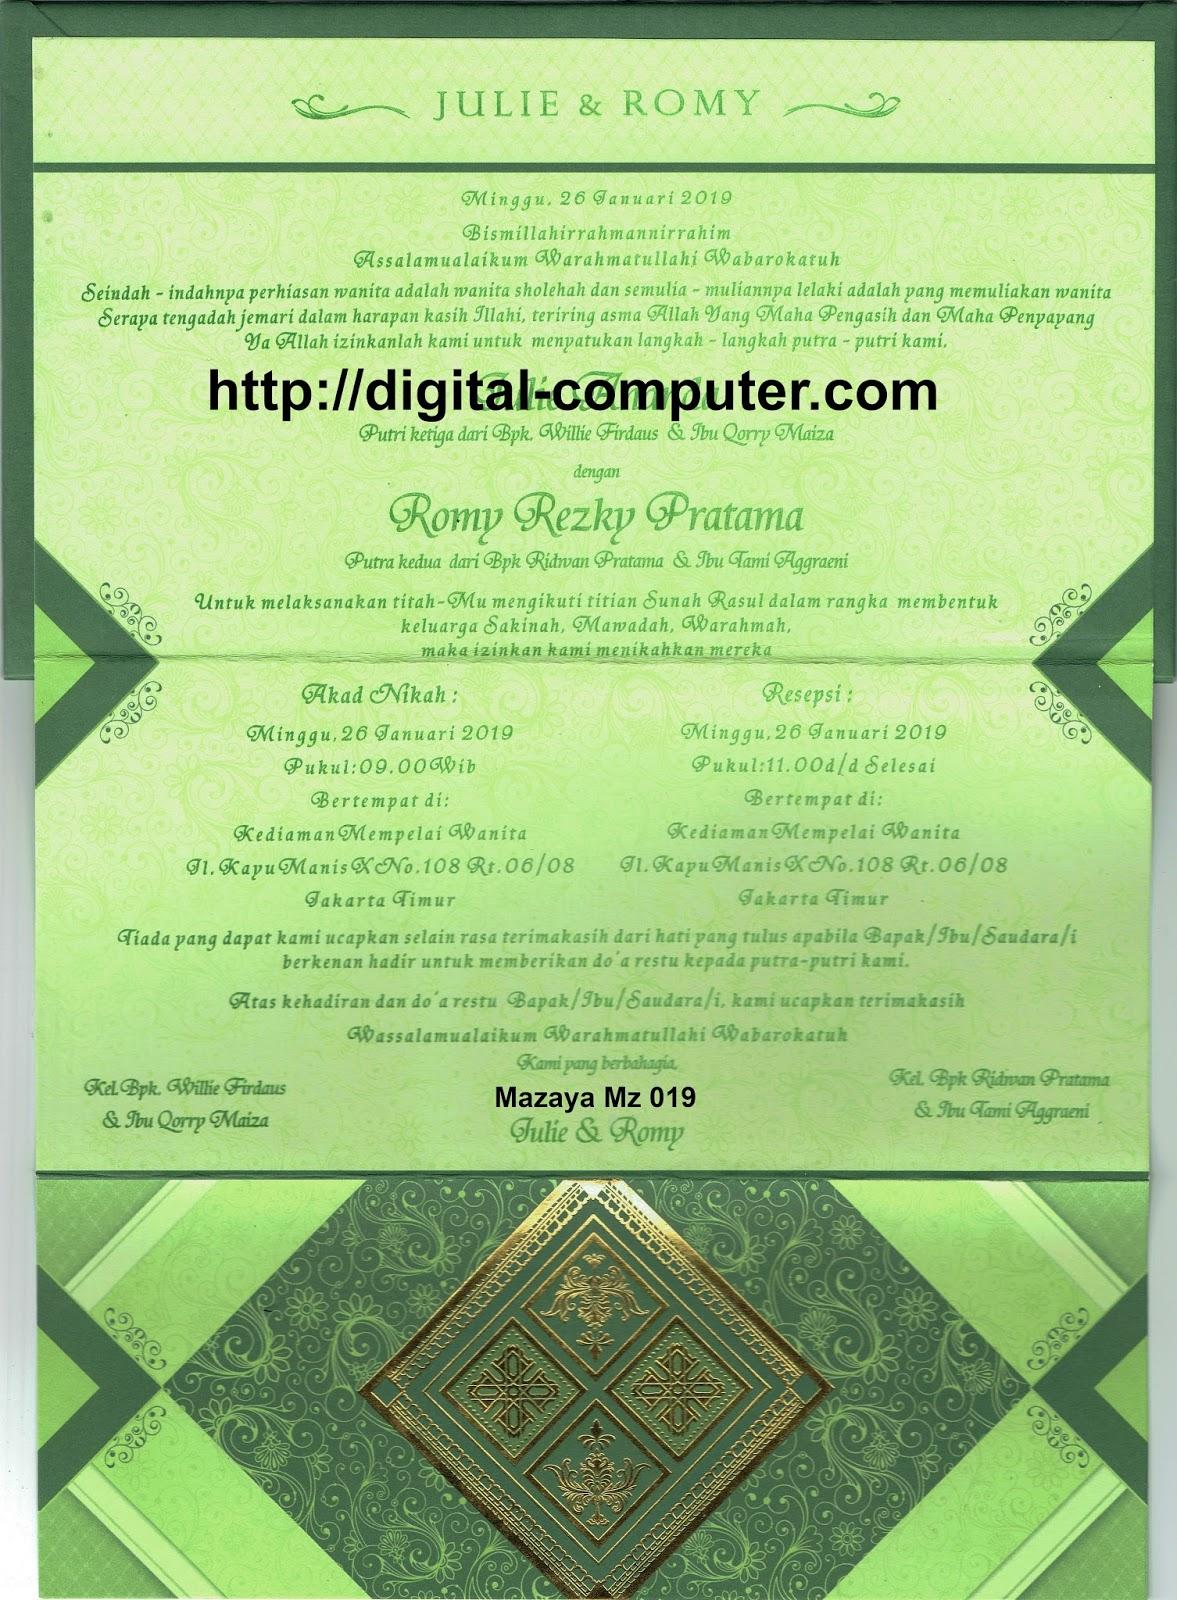 undangan hardcover Mz-019